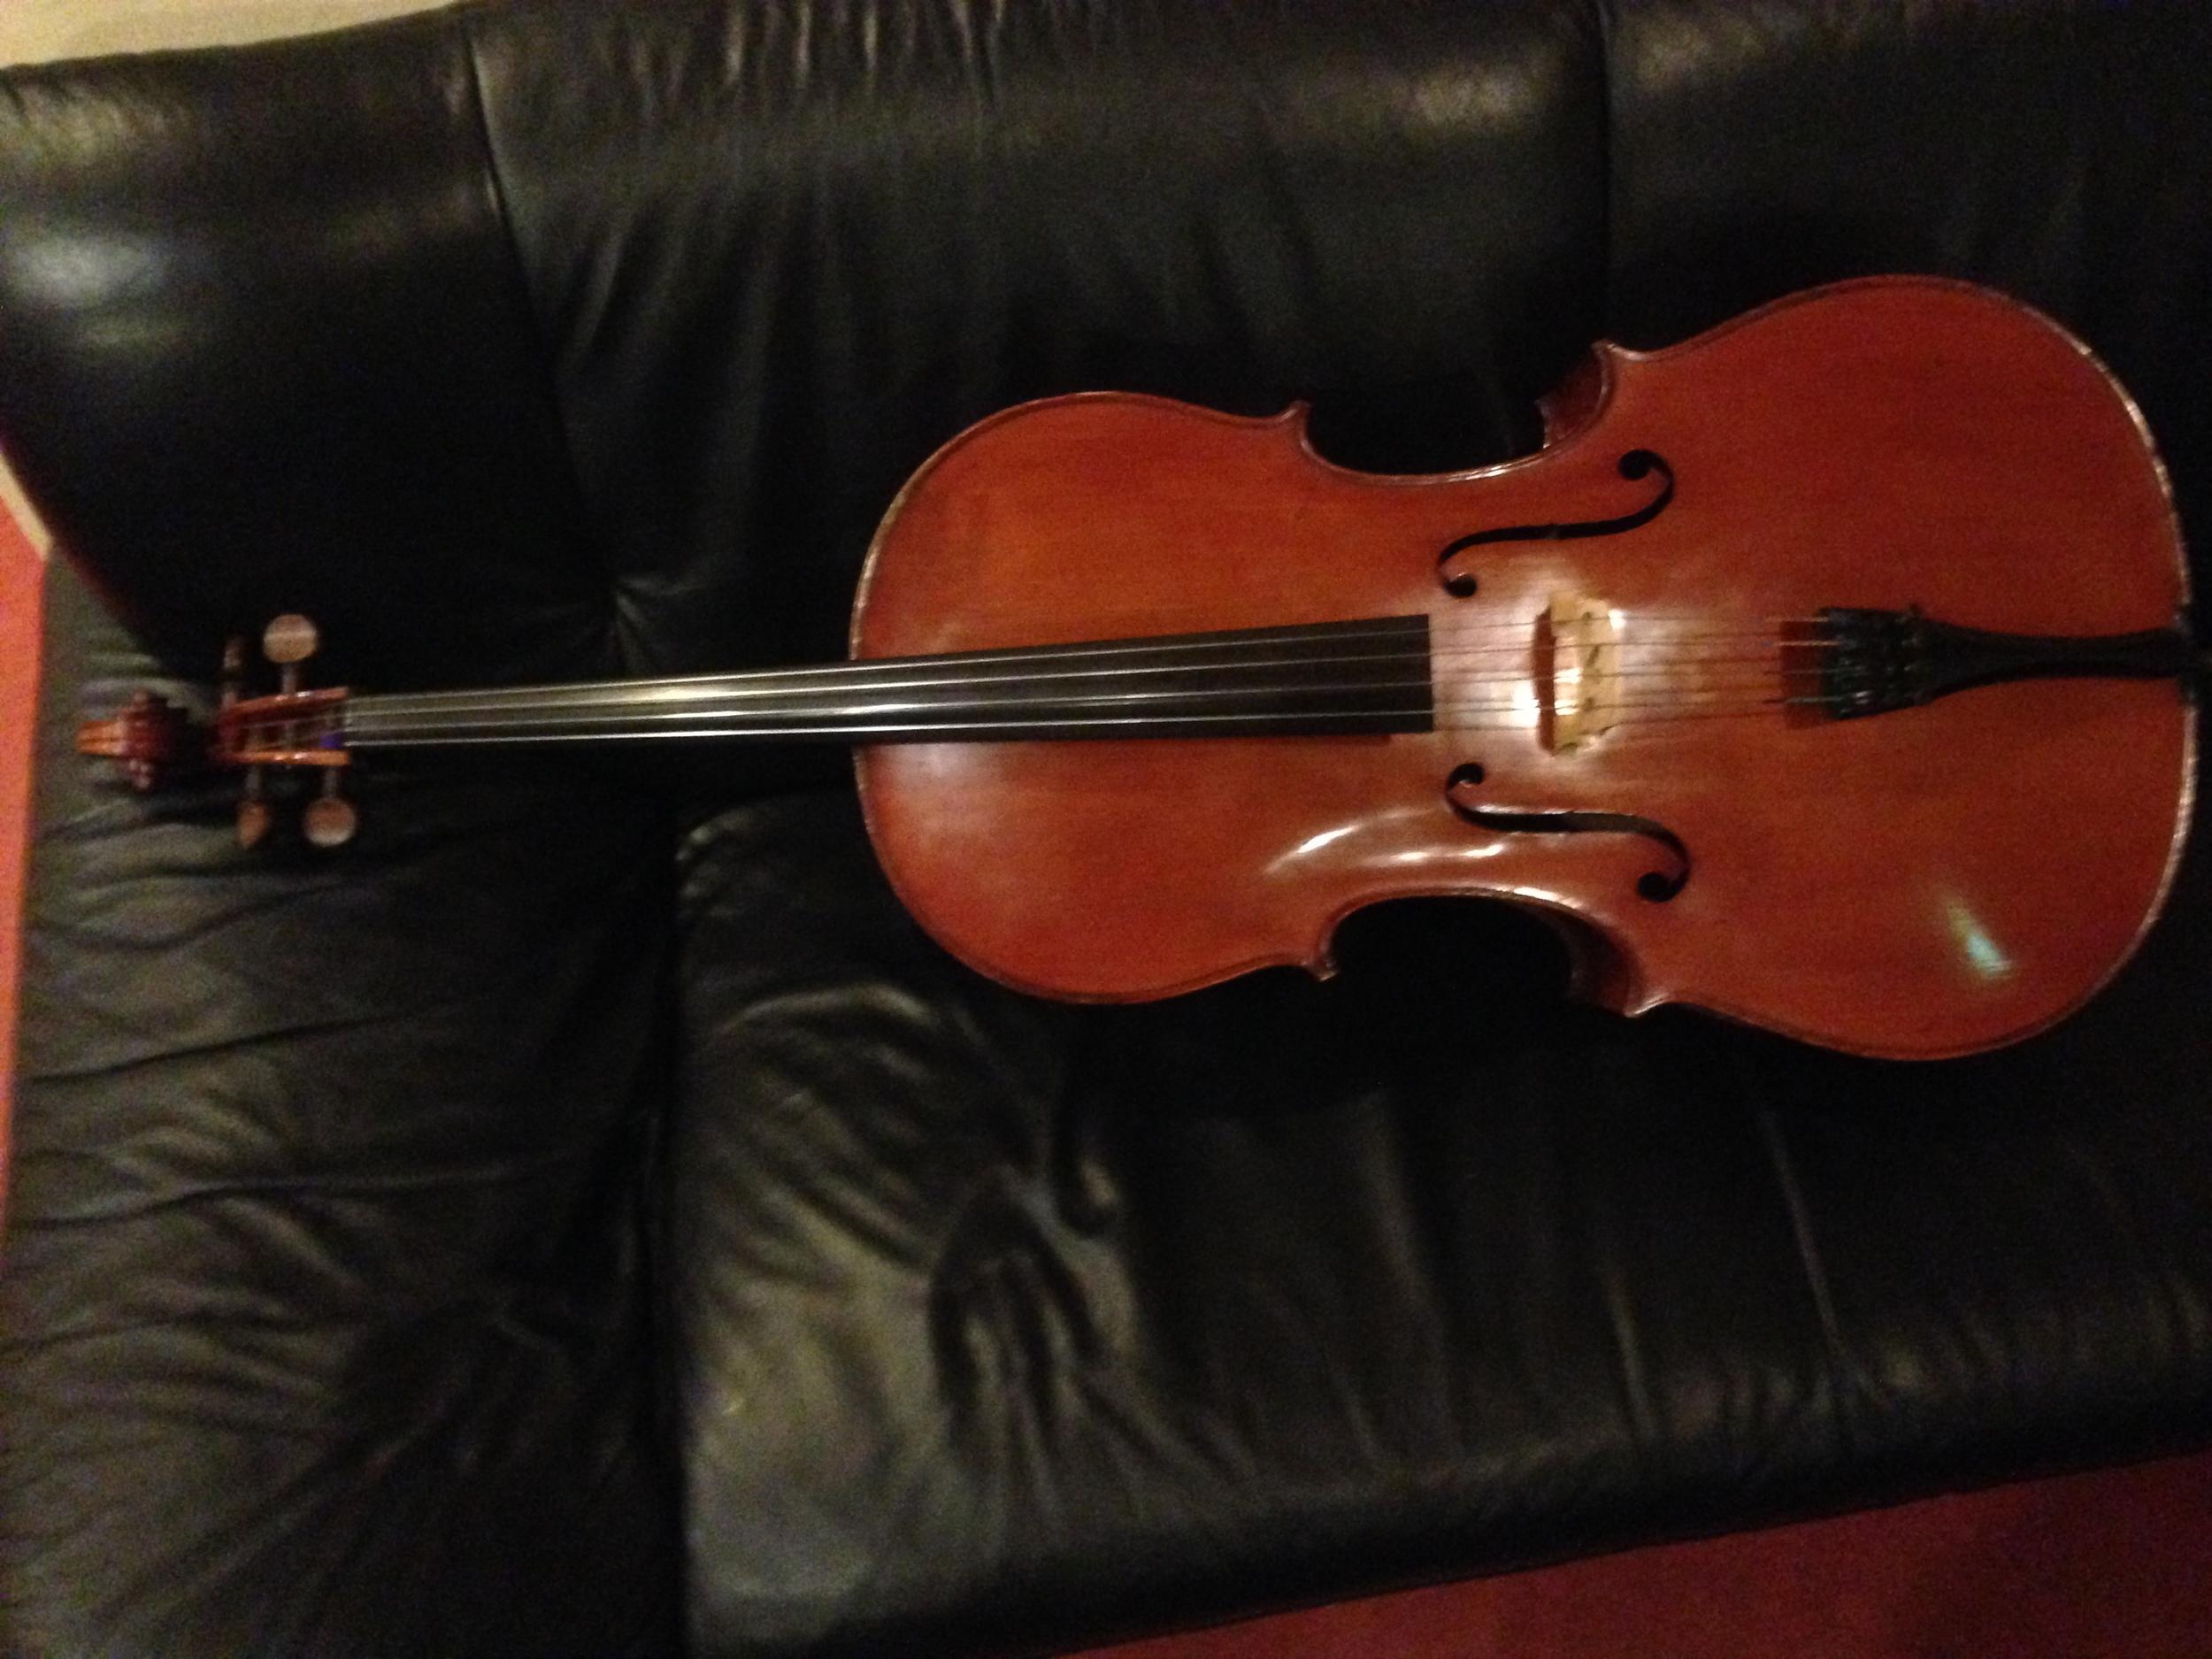 cello front bremen.JPG